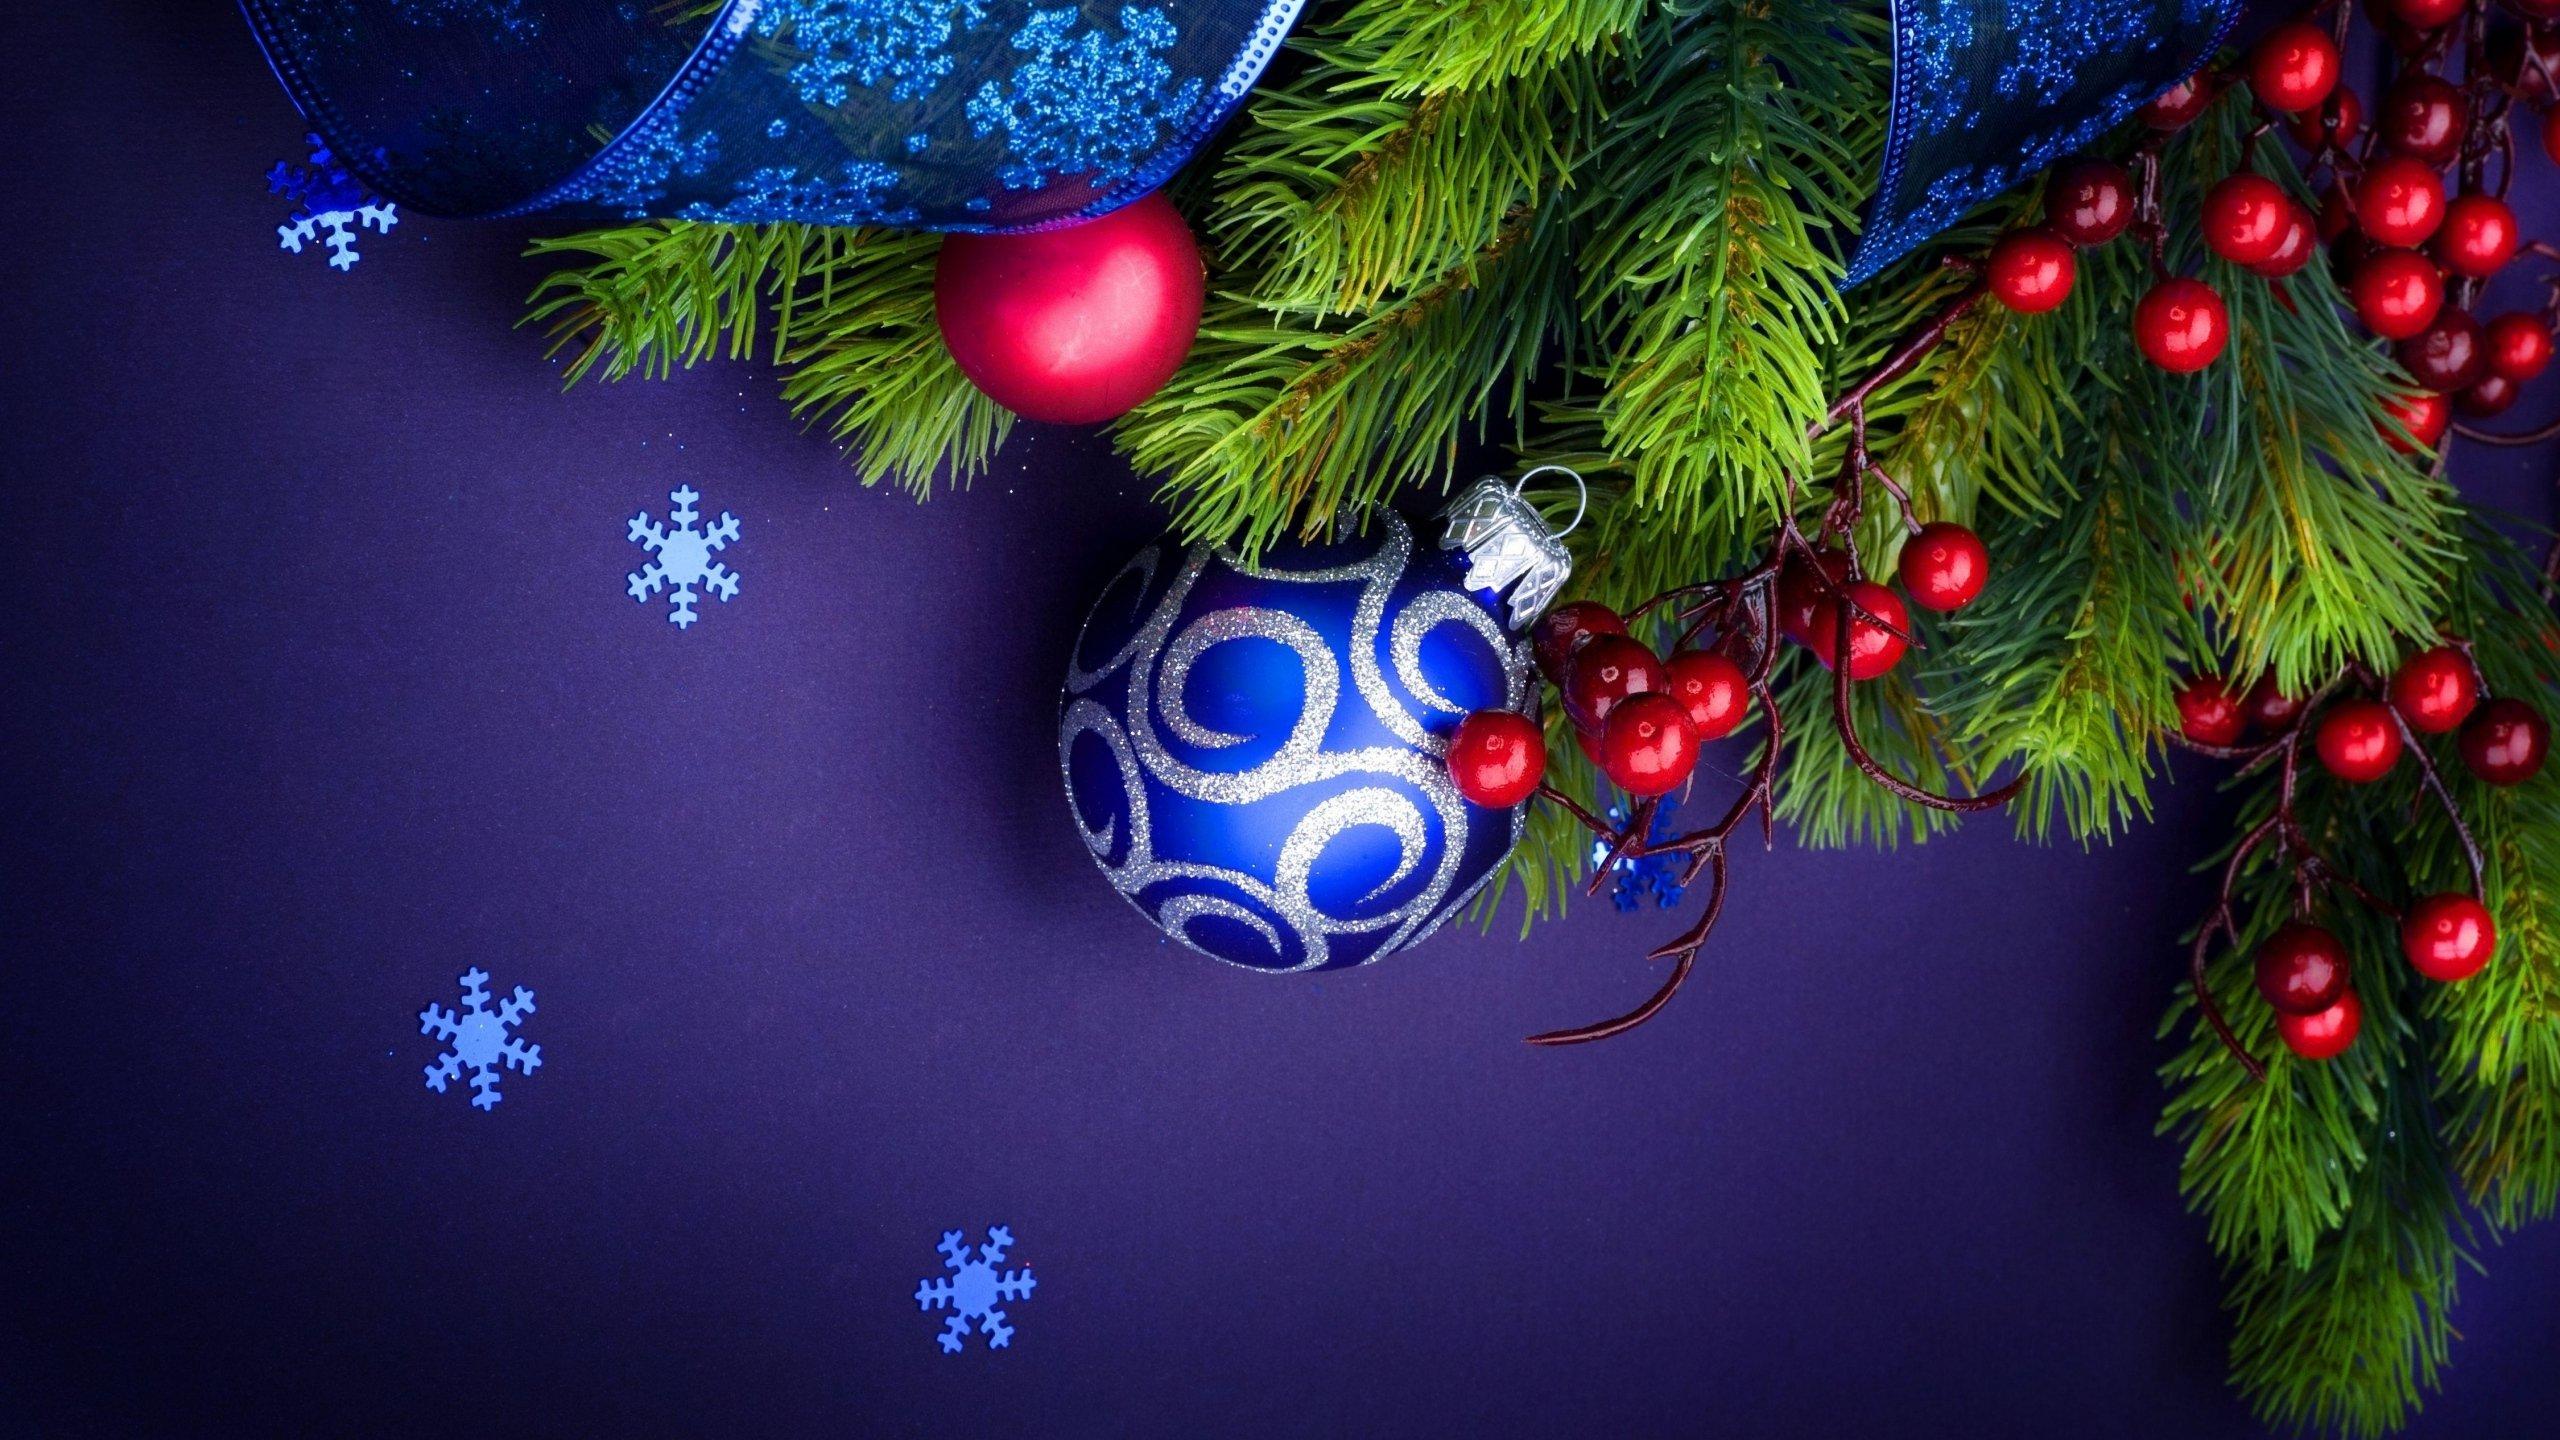 65 Free Desktop Christmas Wallpapers On Wallpapersafari